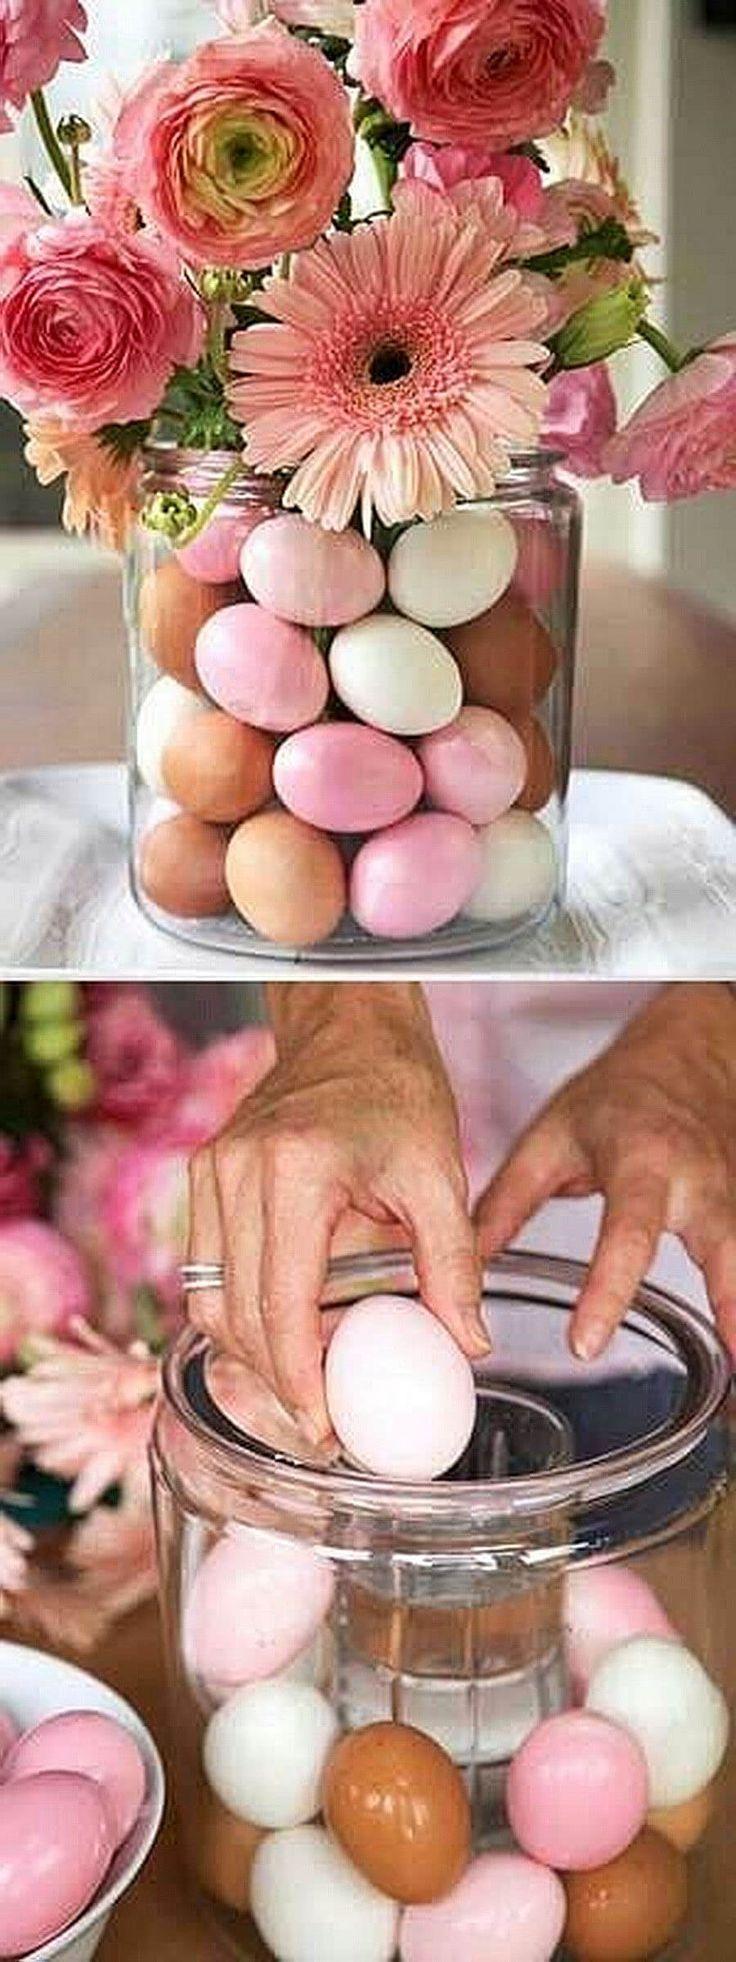 Pretty Pink Posey Egg Display